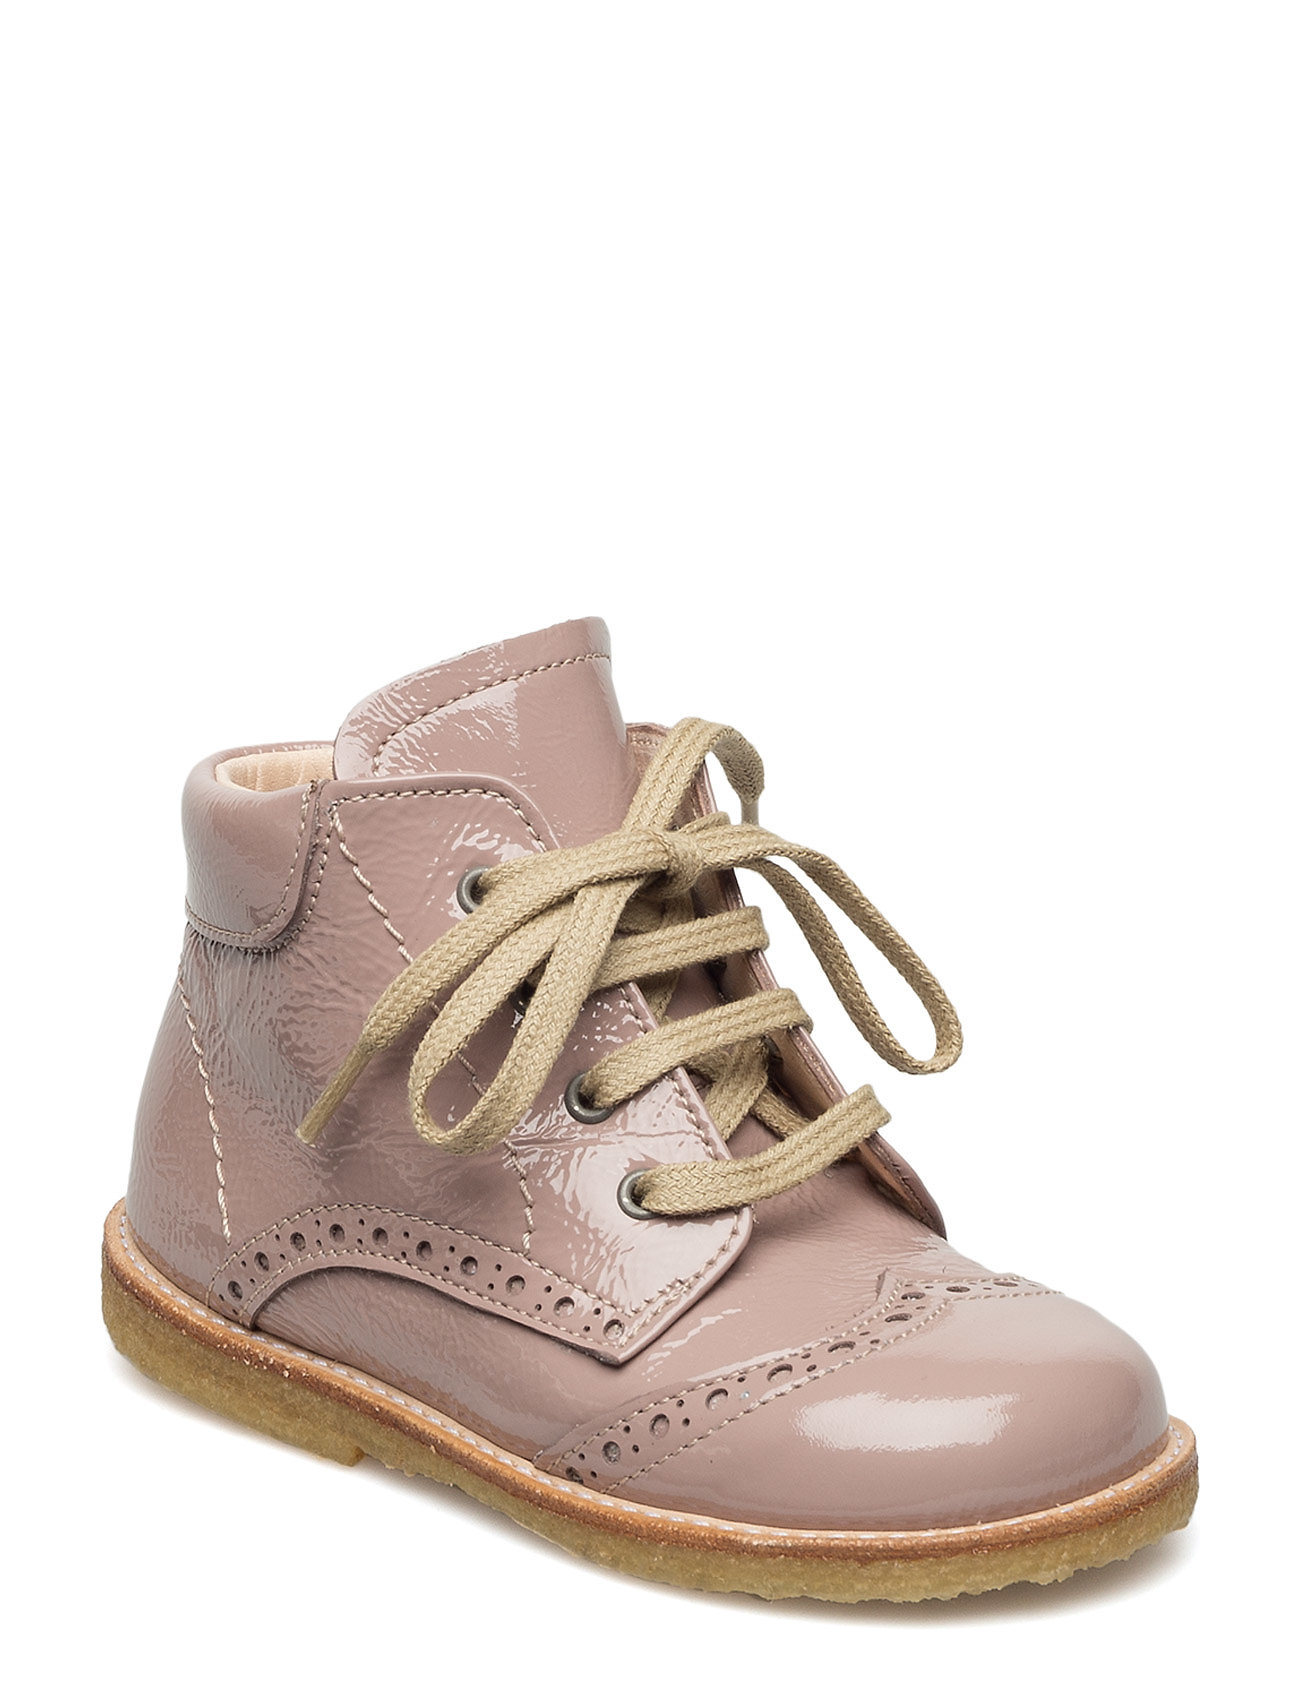 Image of Baby Shoe Shoes Pre Walkers Beginner Shoes 18-25 Lyserød ANGULUS (3484632671)